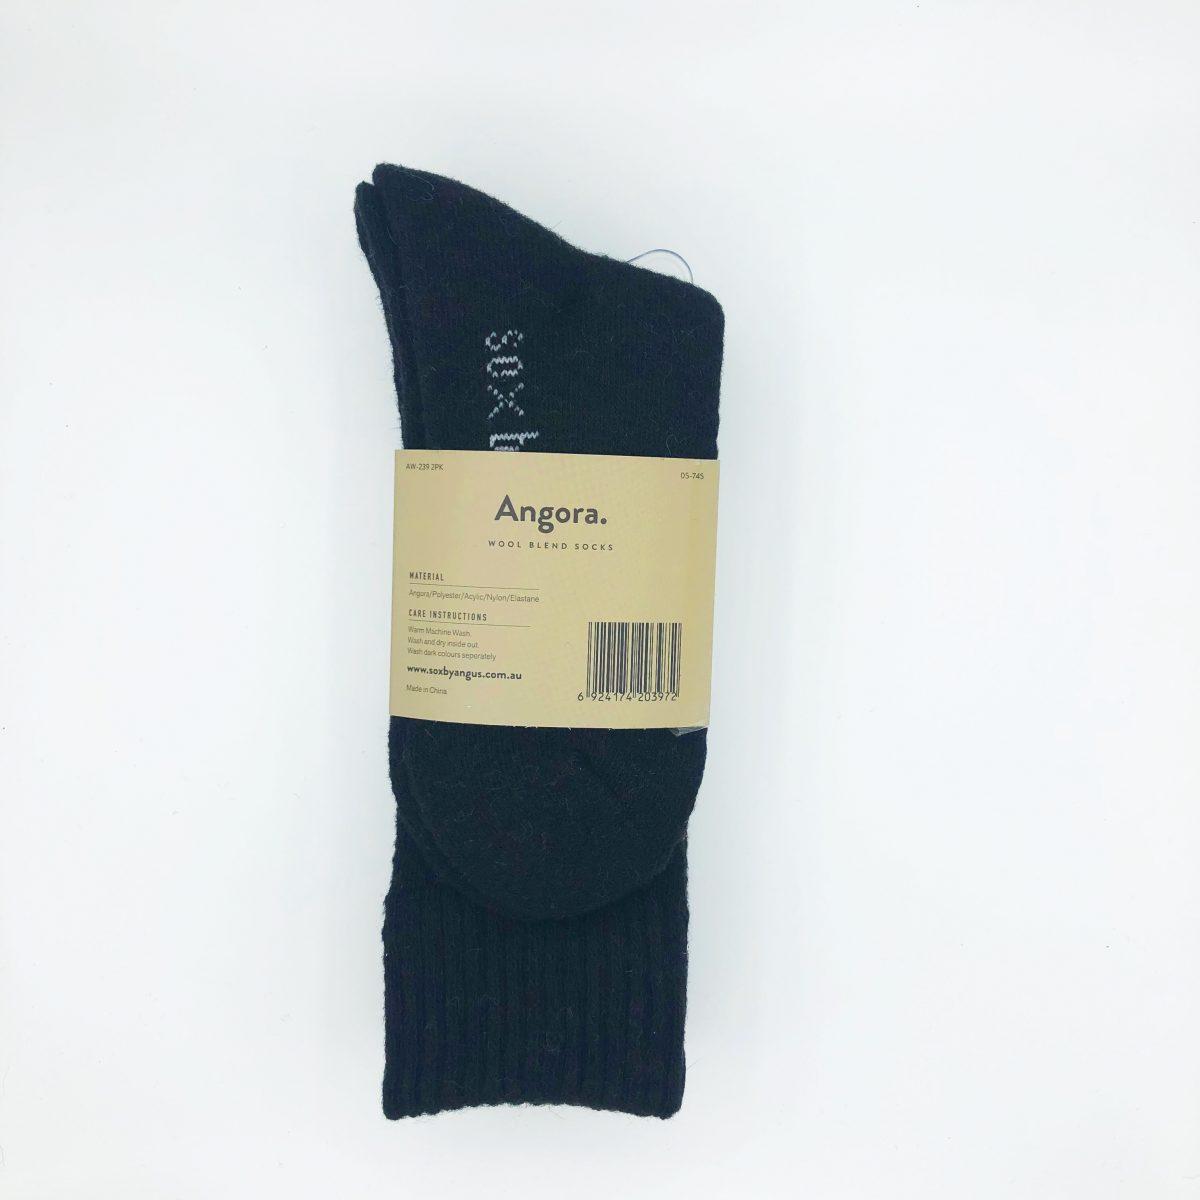 Angora Wool Blend Socks 2 Pair Pack - Black